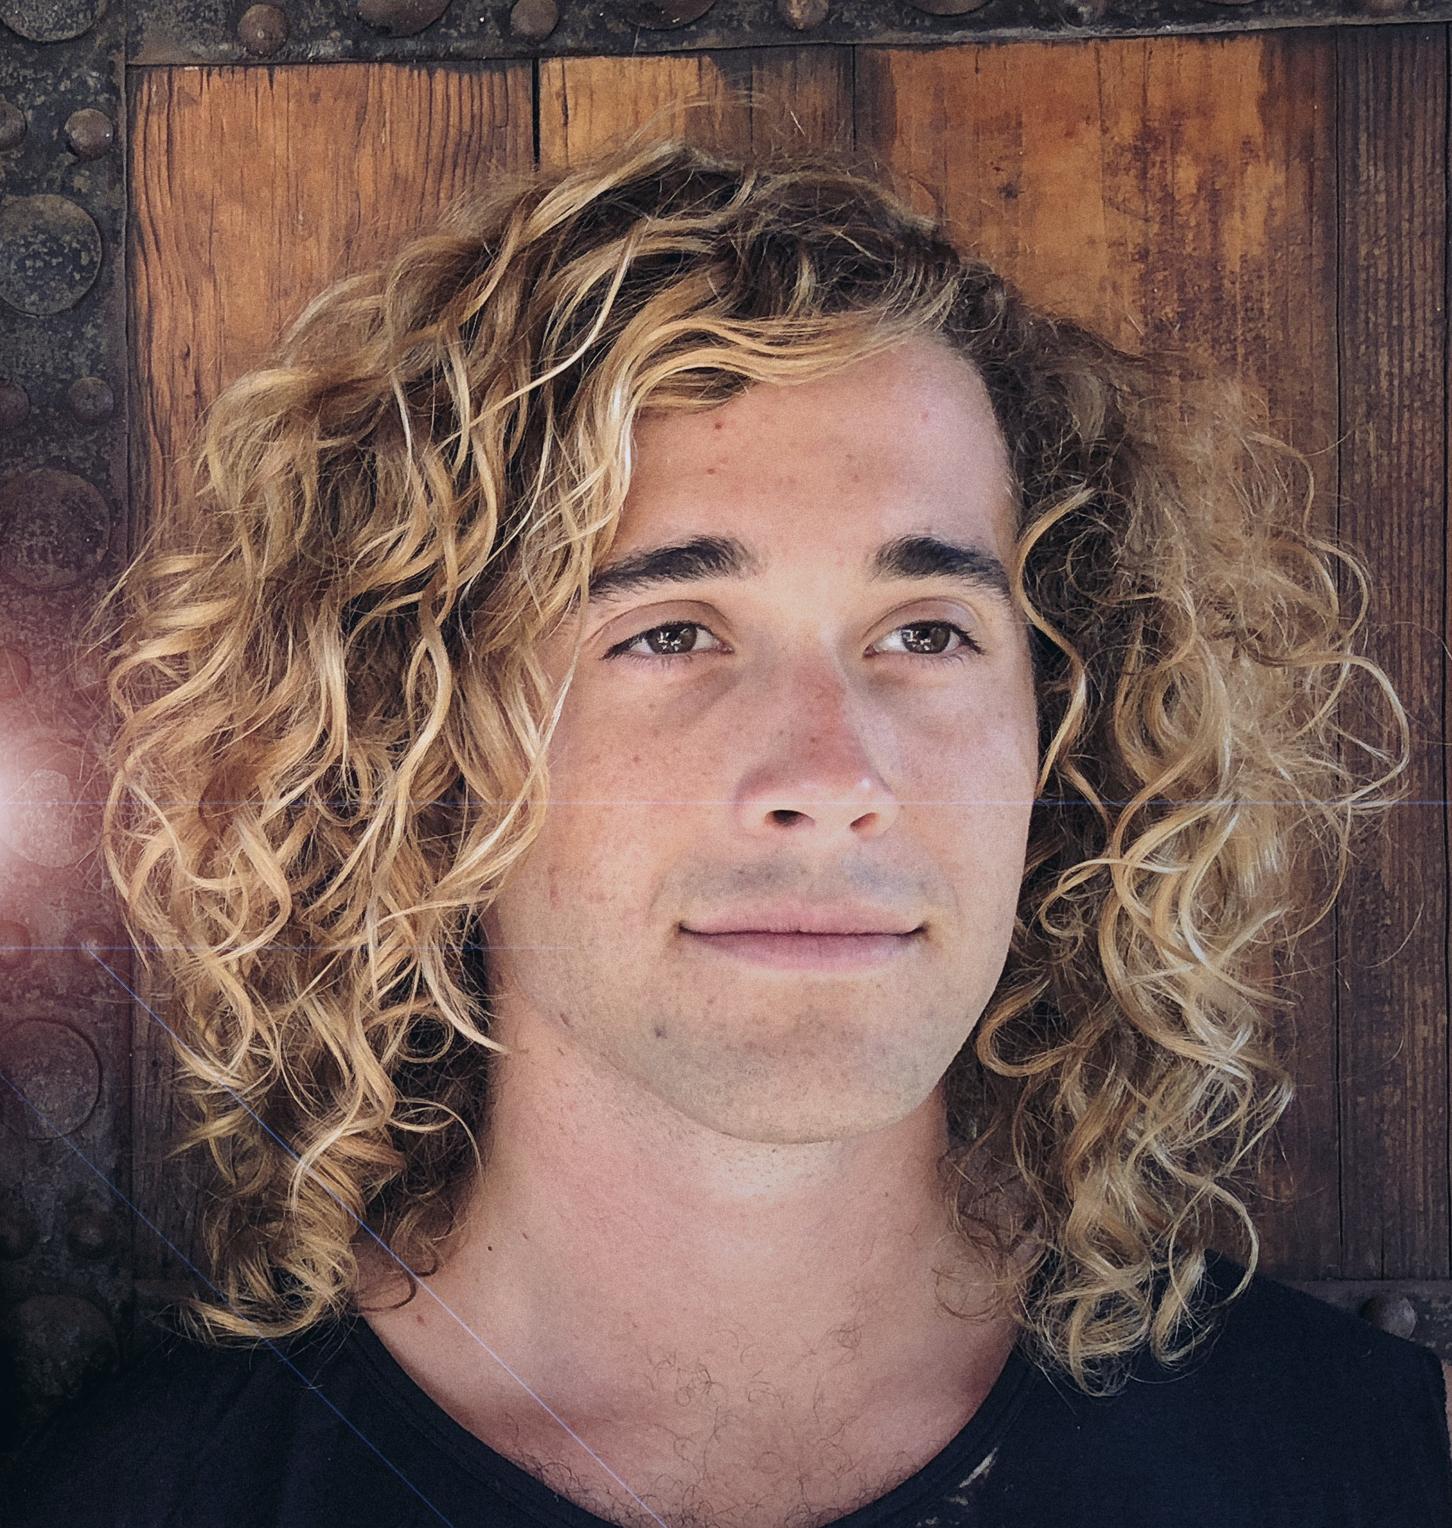 Aaron VanderAa